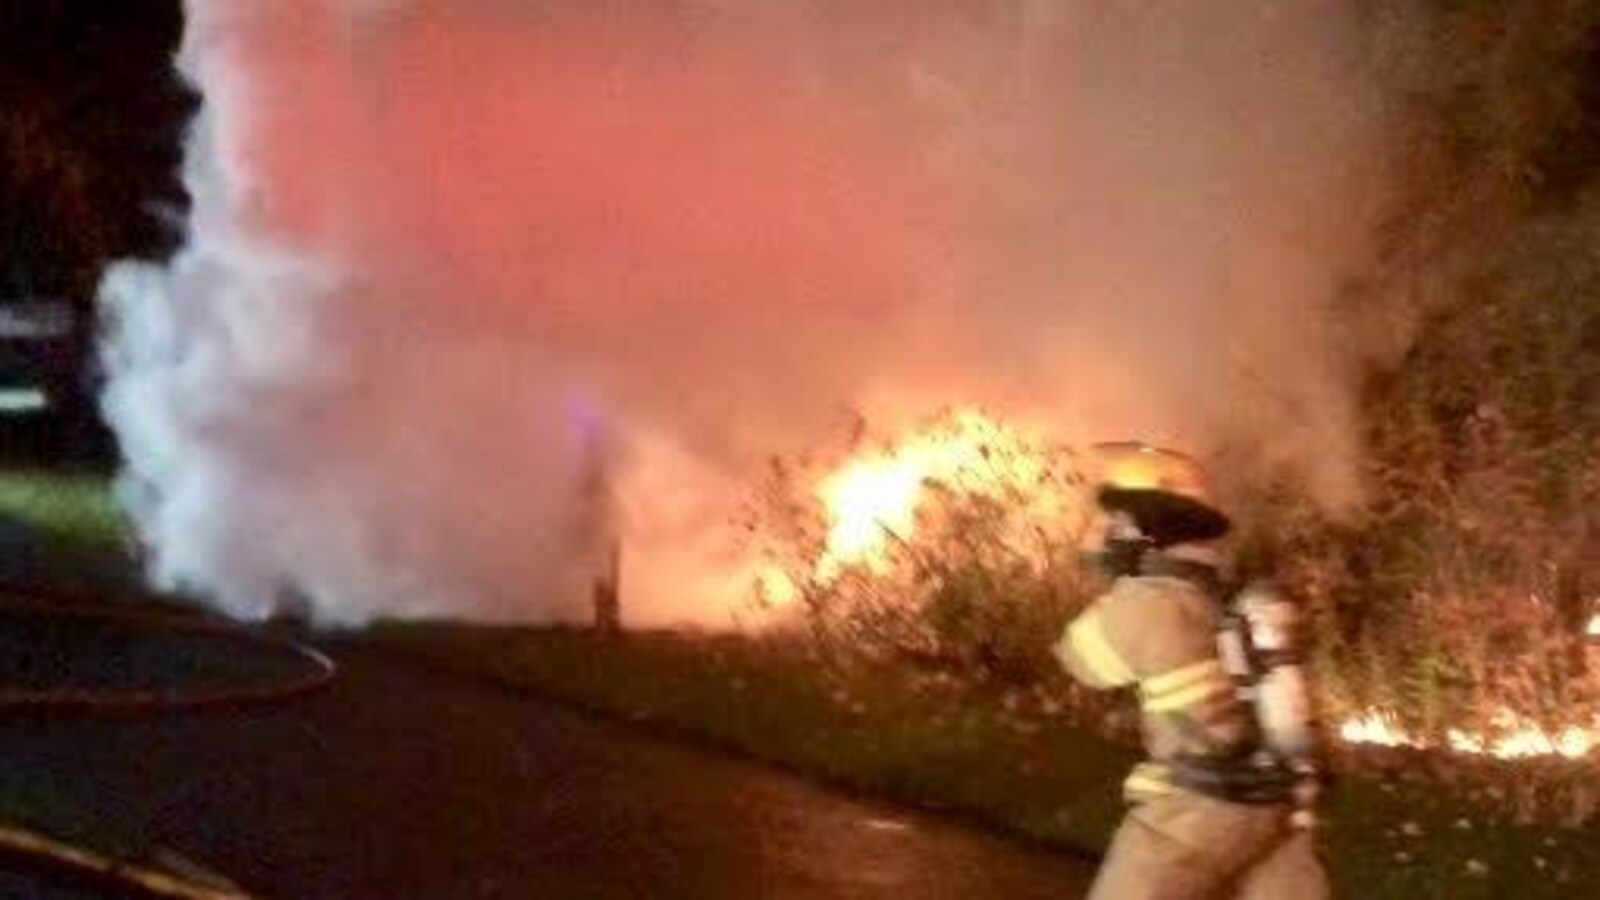 Un pompier se dirigeant vers un véhicule en feu.